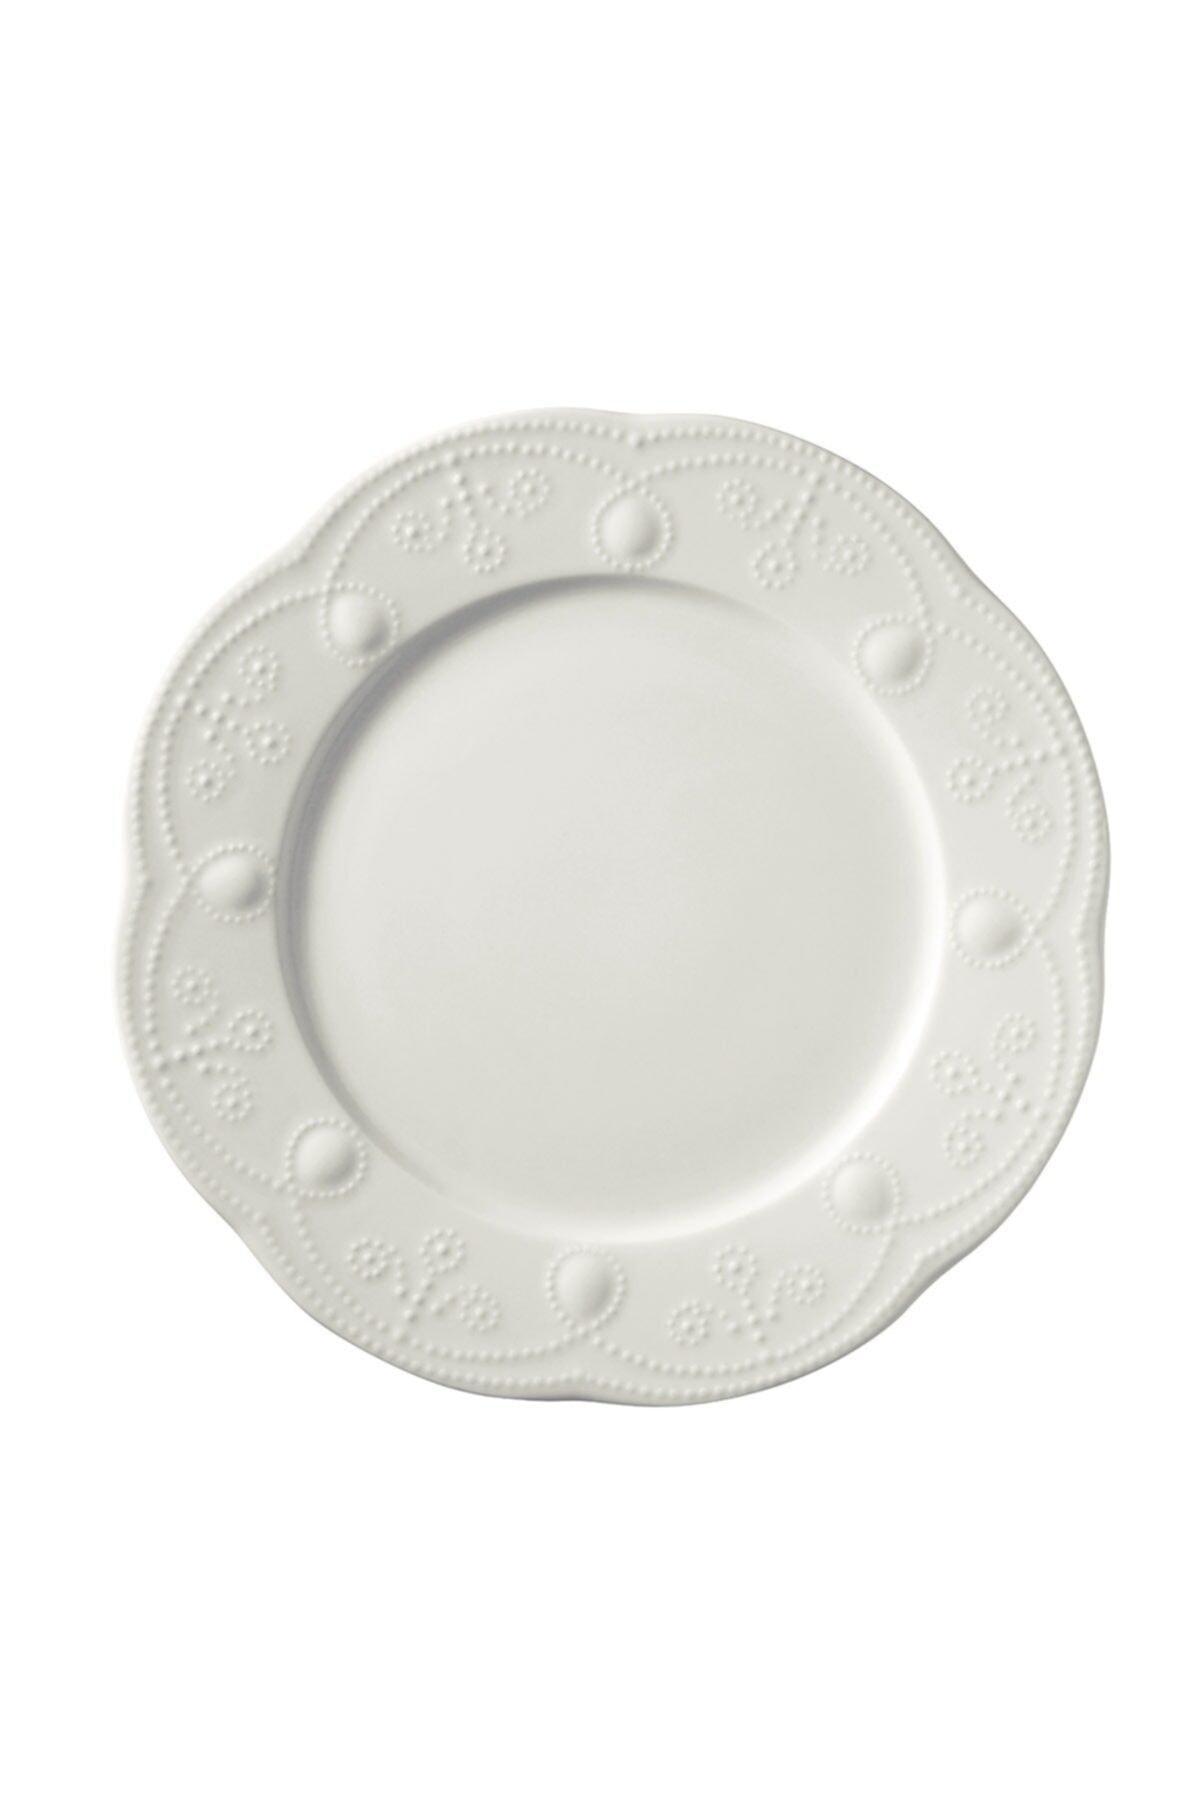 Kütahya Porselen Fulya Krem 24 Parça Yemek Seti 2